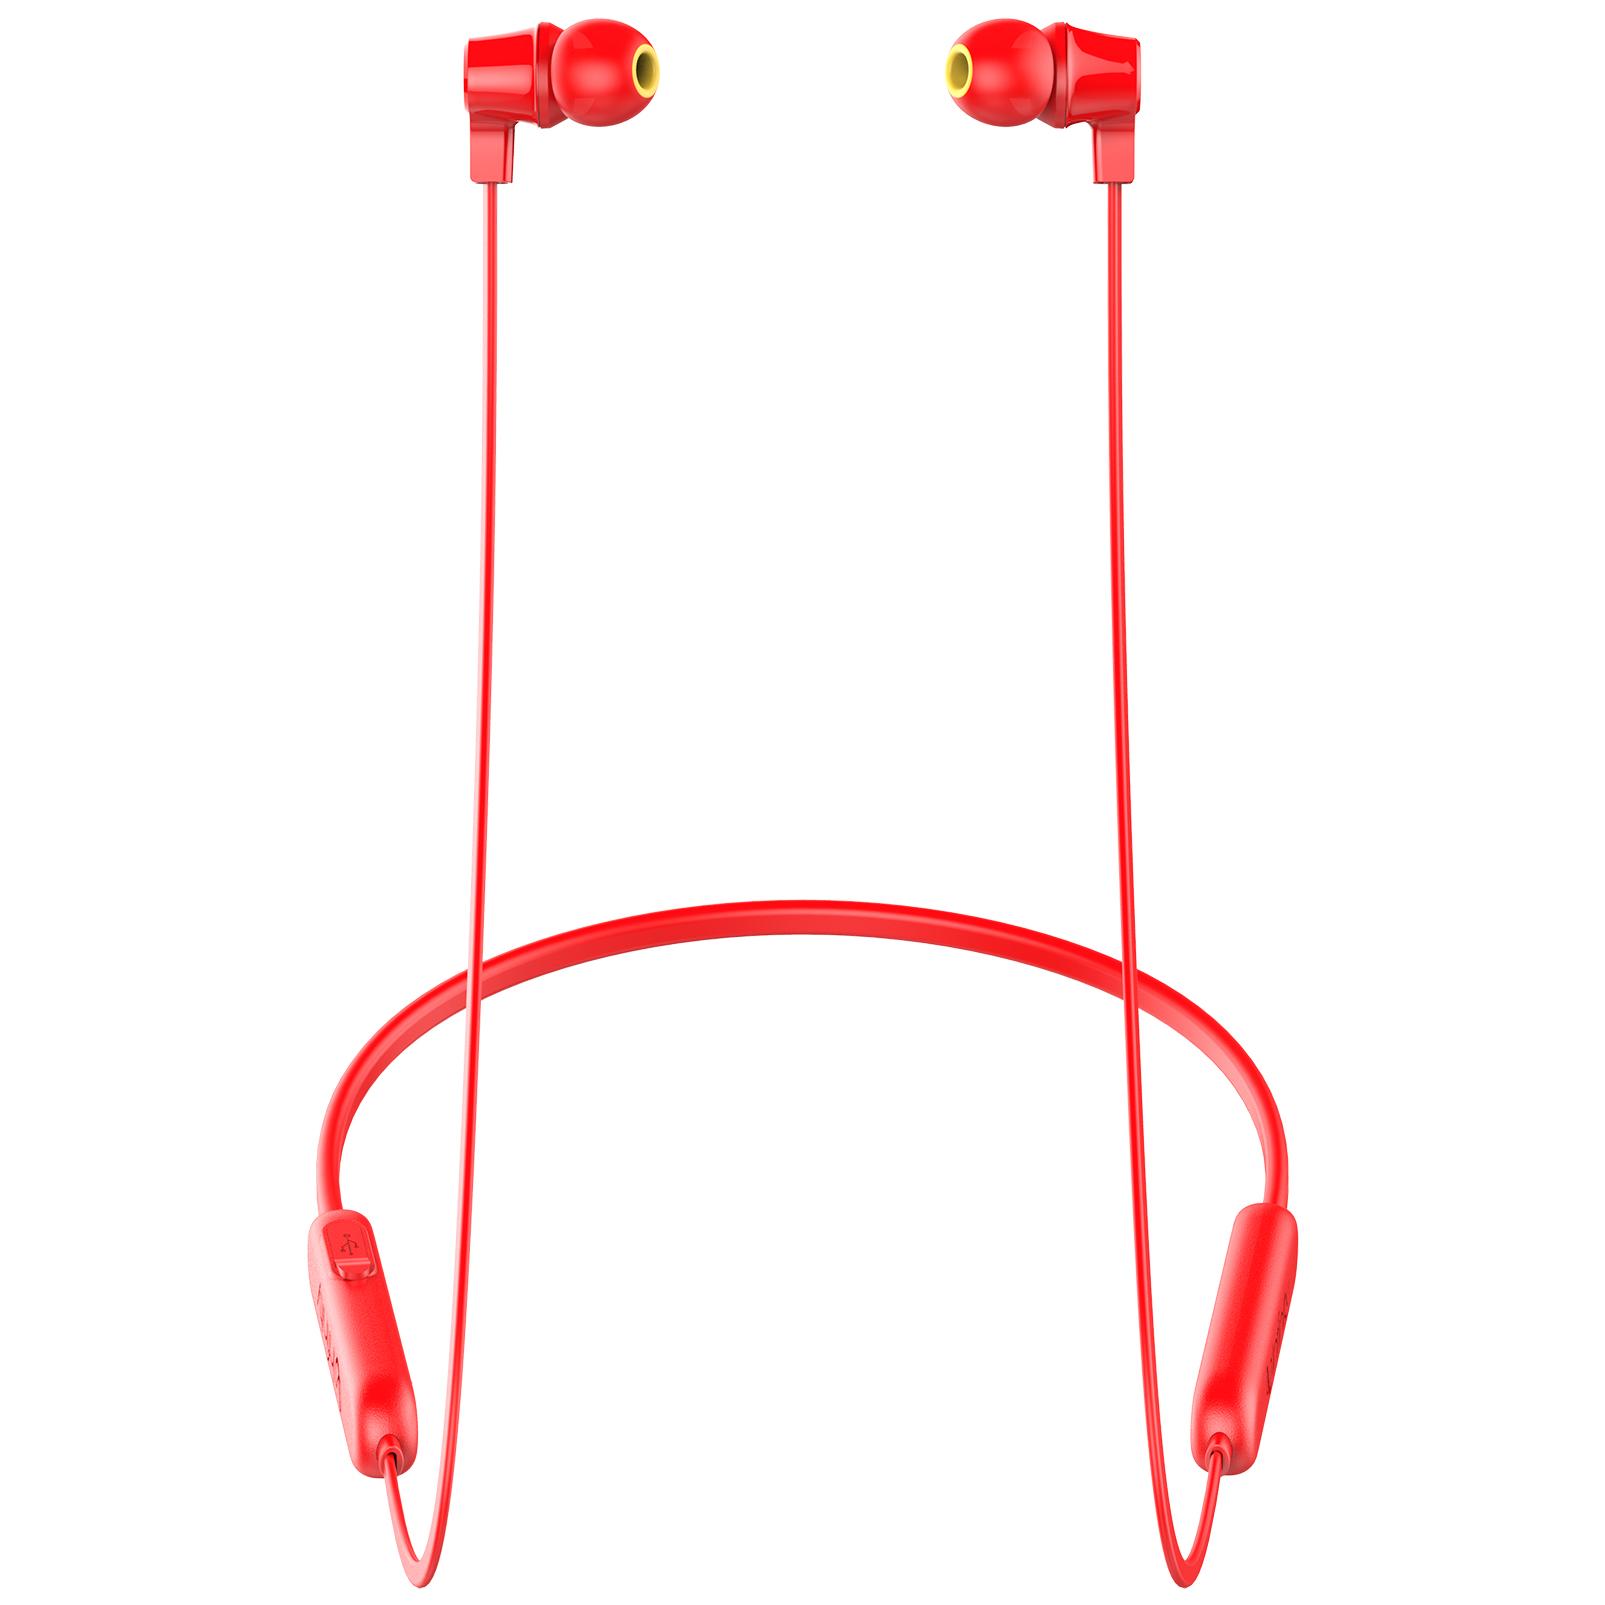 INFINITY GLIDE N100 - Red - In-Ear Ultra Light Neckband - Left